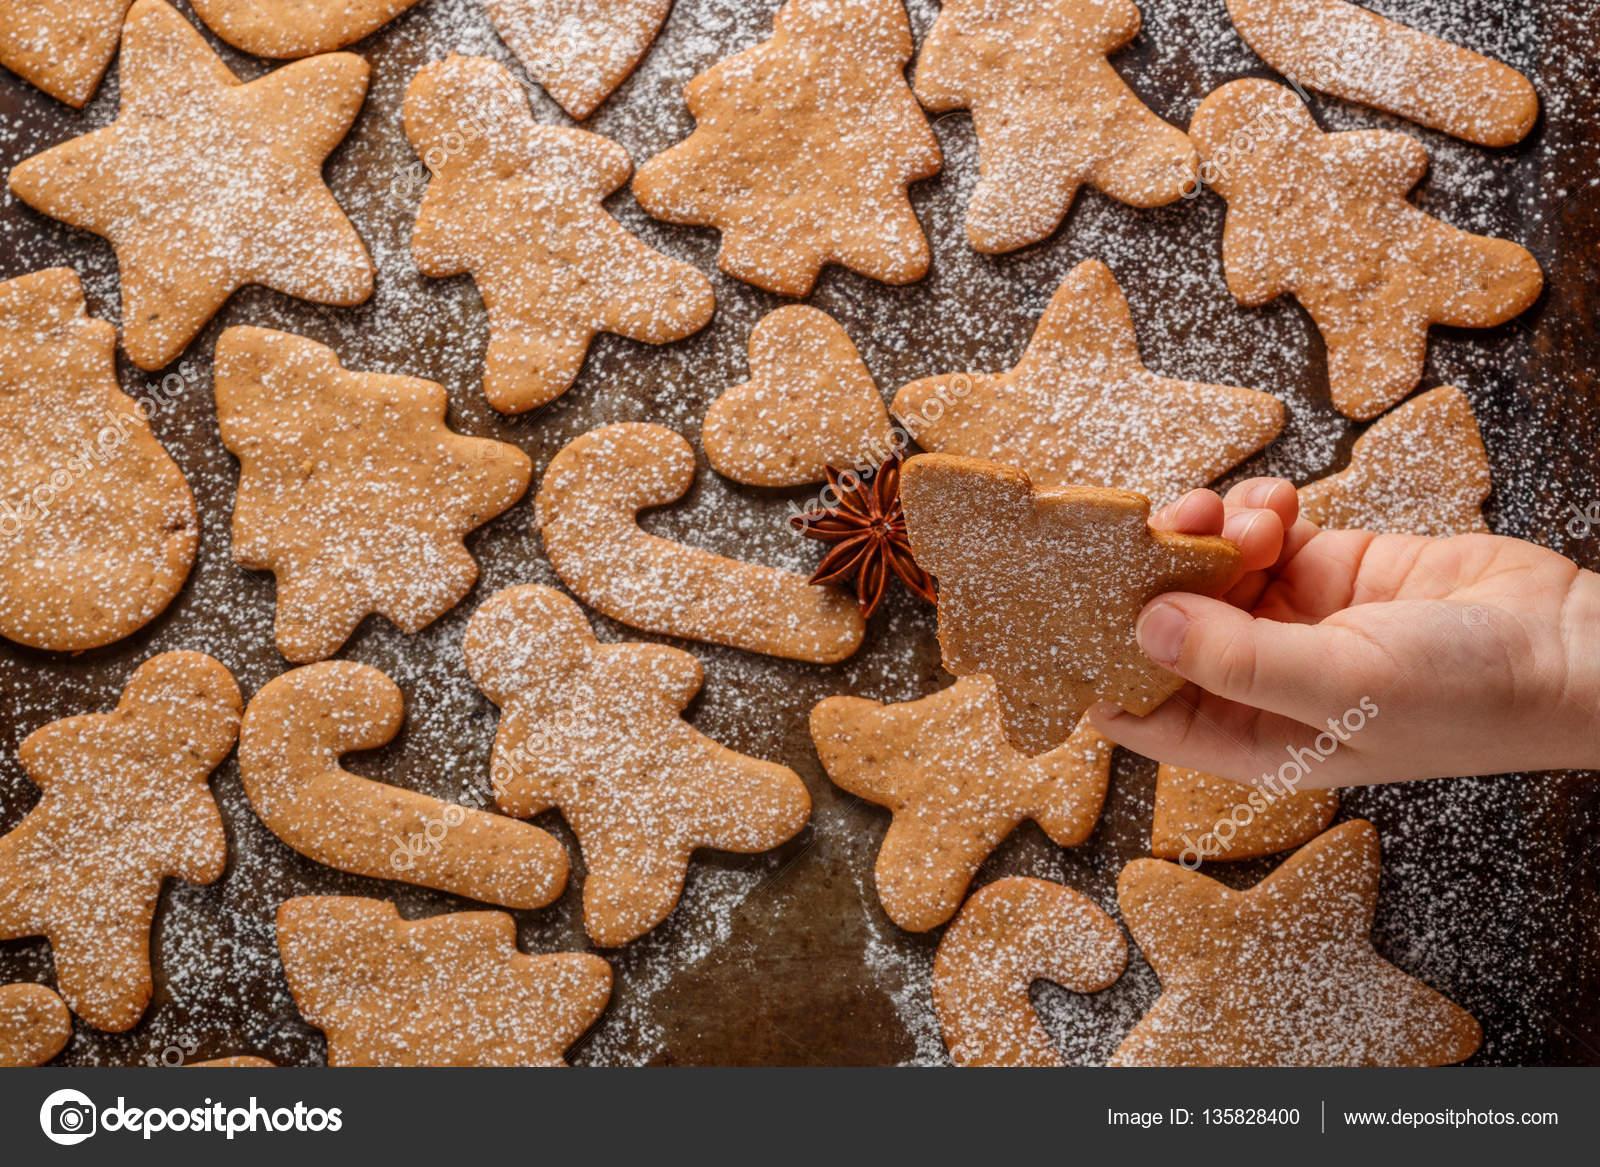 Traditionelles Weihnachtsgebäck.Traditionelles Weihnachtsgebäck Mit Gewürzen Und Puderzucker In Form